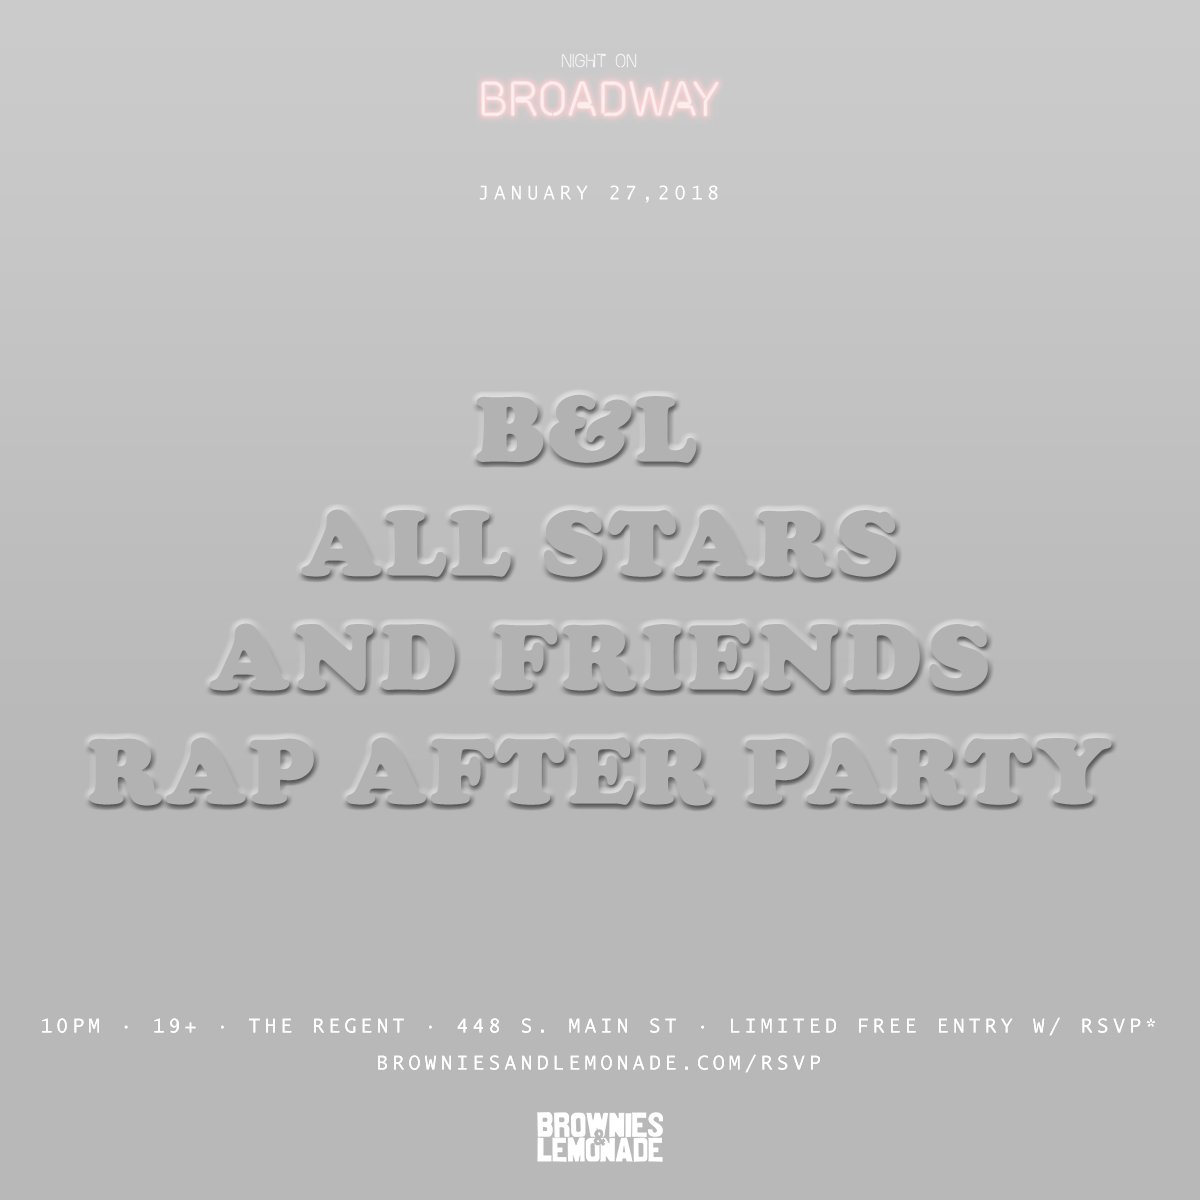 ANNOUNCING🎉 B&L ALL STARS & FRIENDS RAP AFTER PARTY SATURDAY 1/27 💊 ⚜ 🏰 🇸🇬 📆 🍫🍋 RSVP → http://browniesandlemonade.com/rsvp  FREE ENTRY W/ @MVNGCSTL WORLD TIX → http://bit.ly/movingcastleworld…